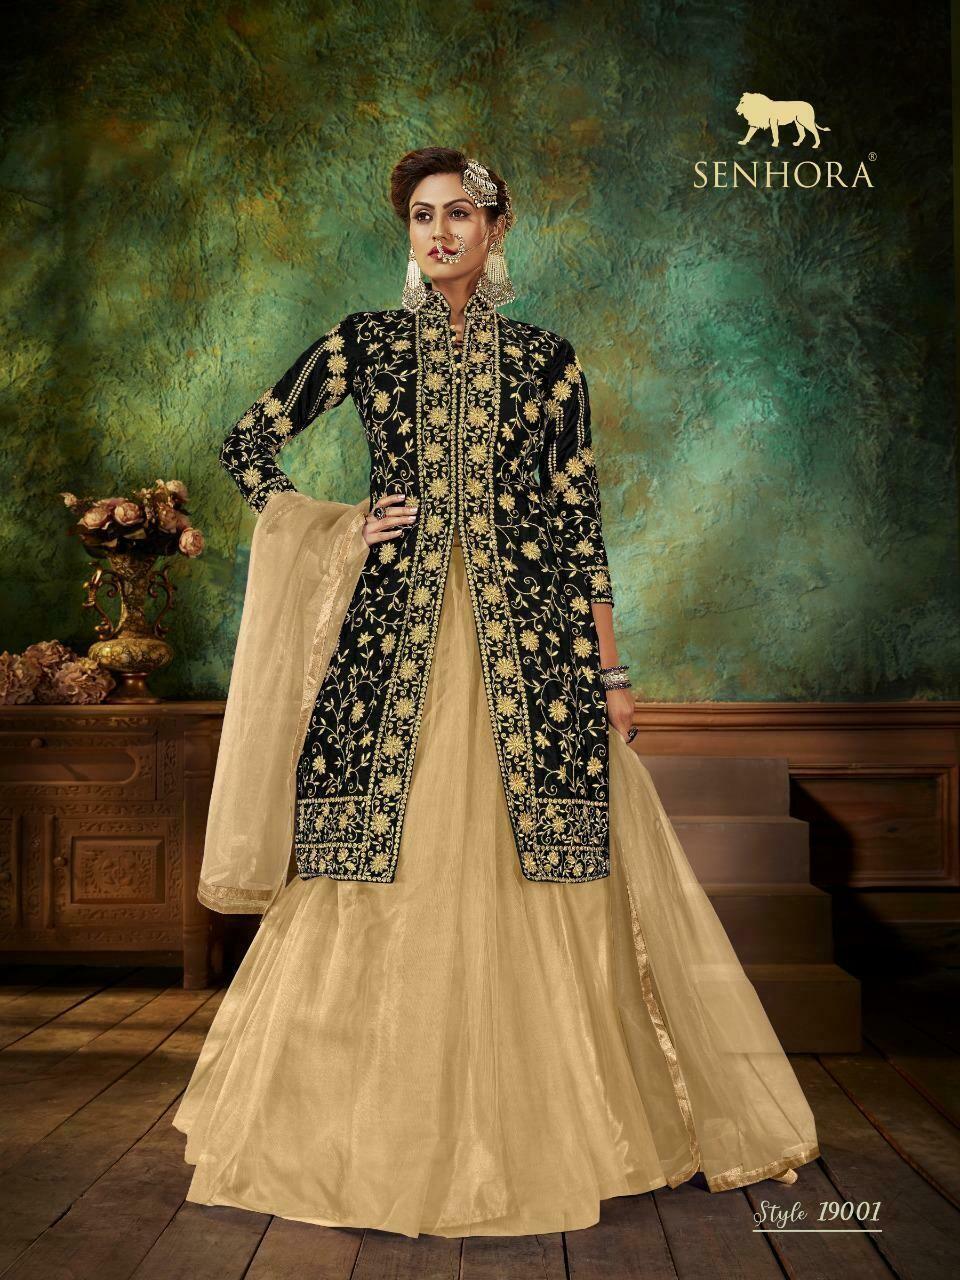 senhora zara new designer heavy dress catalog